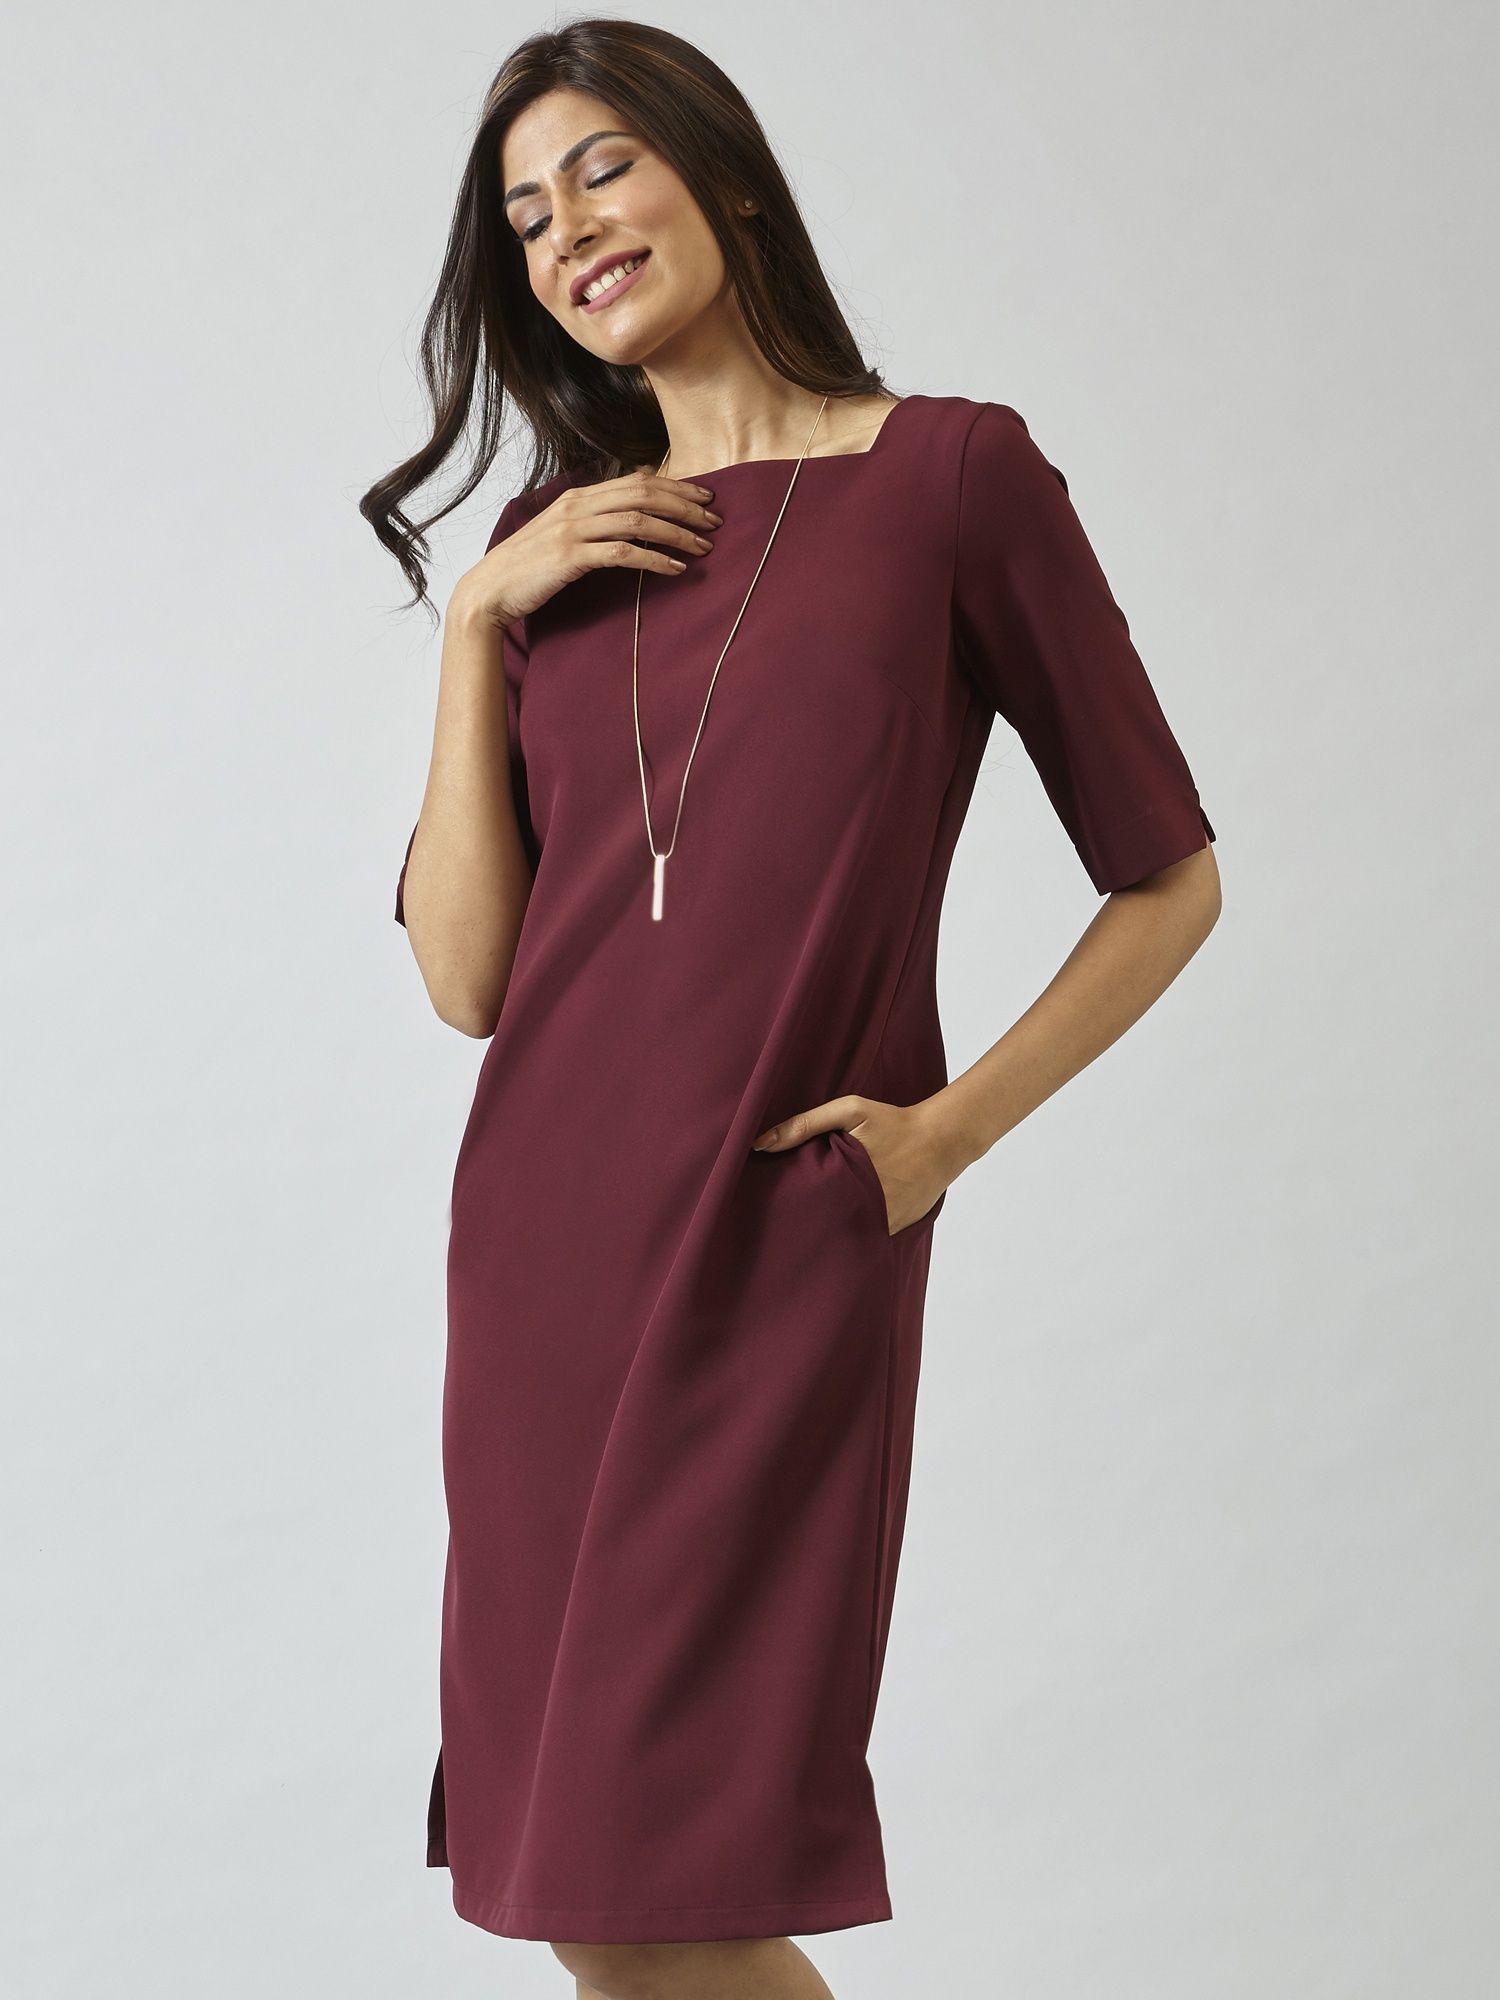 f44766e3c8 FableStreet Dresses   Buy FableStreet Elbow Length Sleeves Wide Neck Shift  Dress - Maroon Online